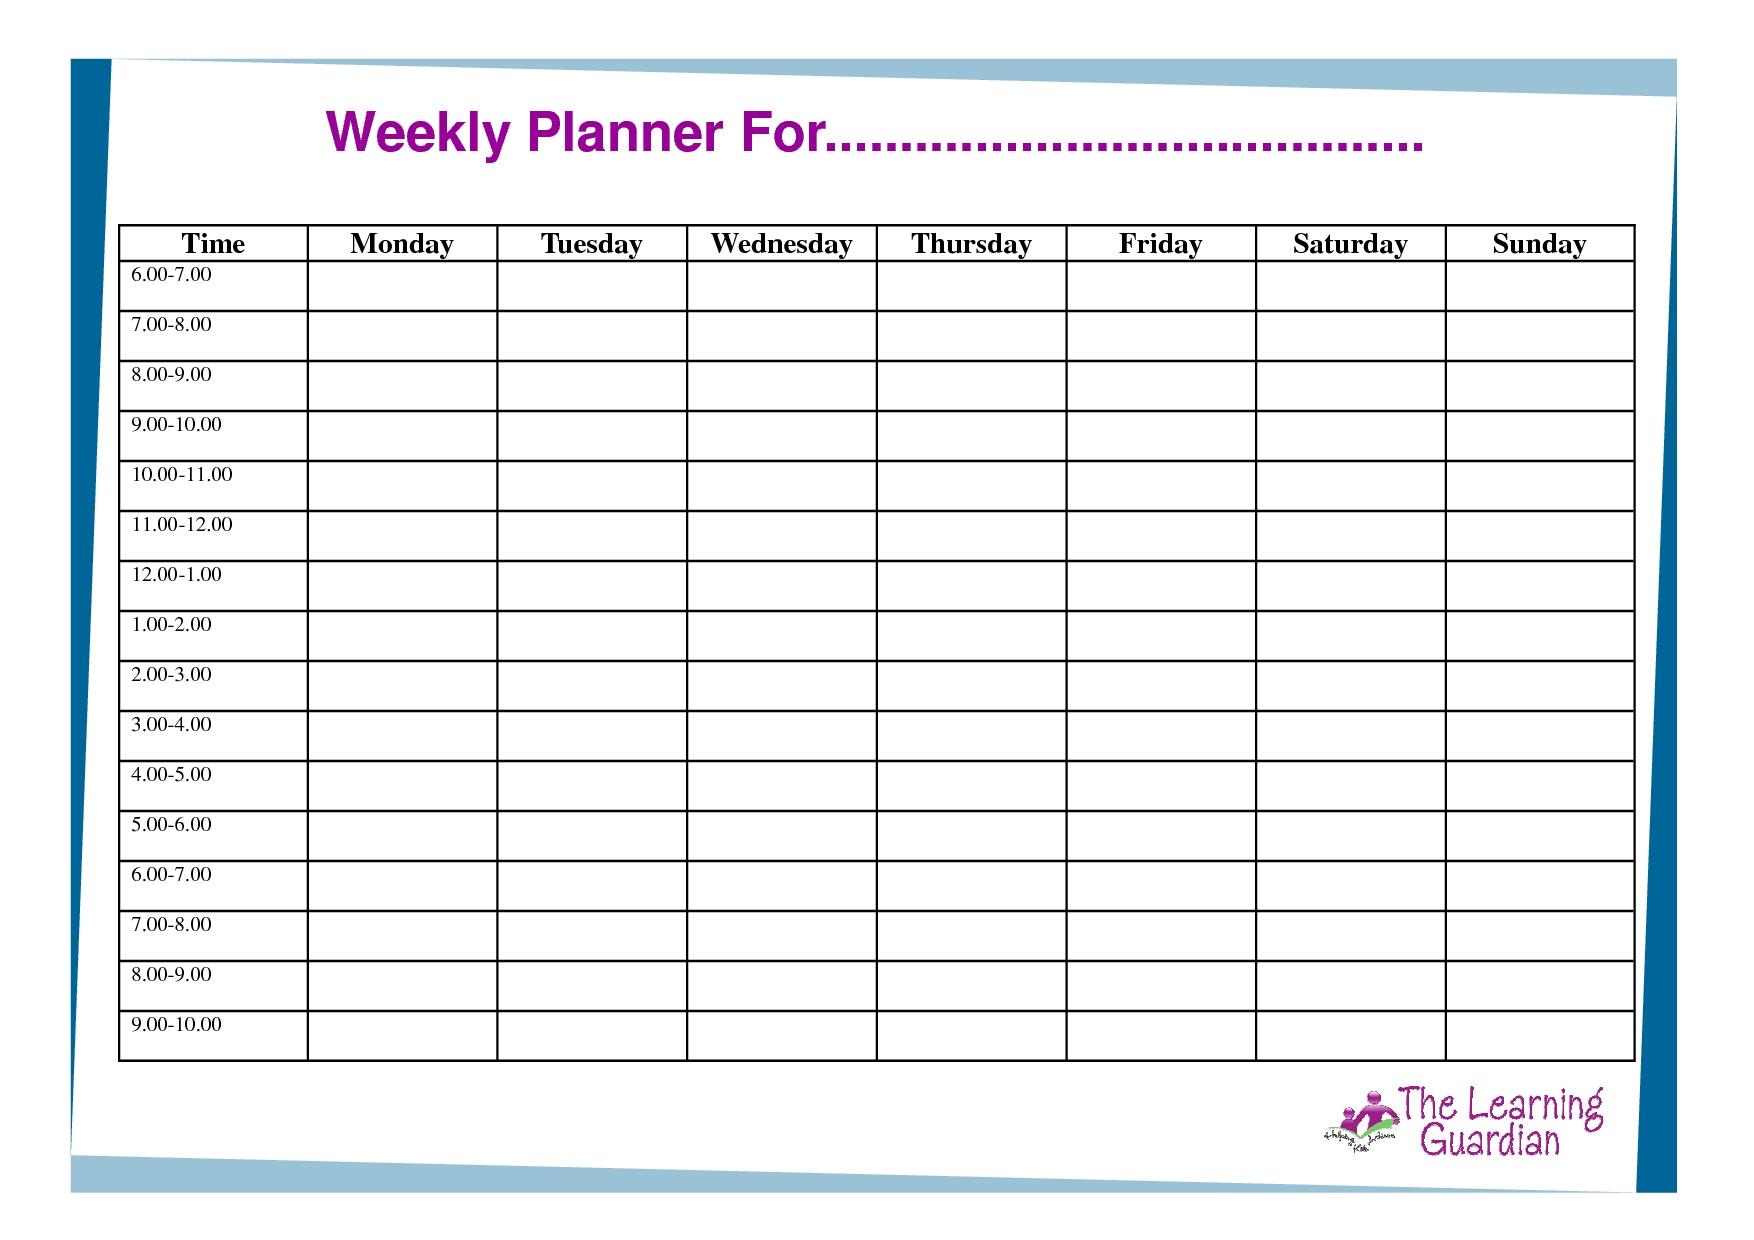 Week Calendar Template Day Blank | Smorad intended for 7 Day Week Blank Calendar